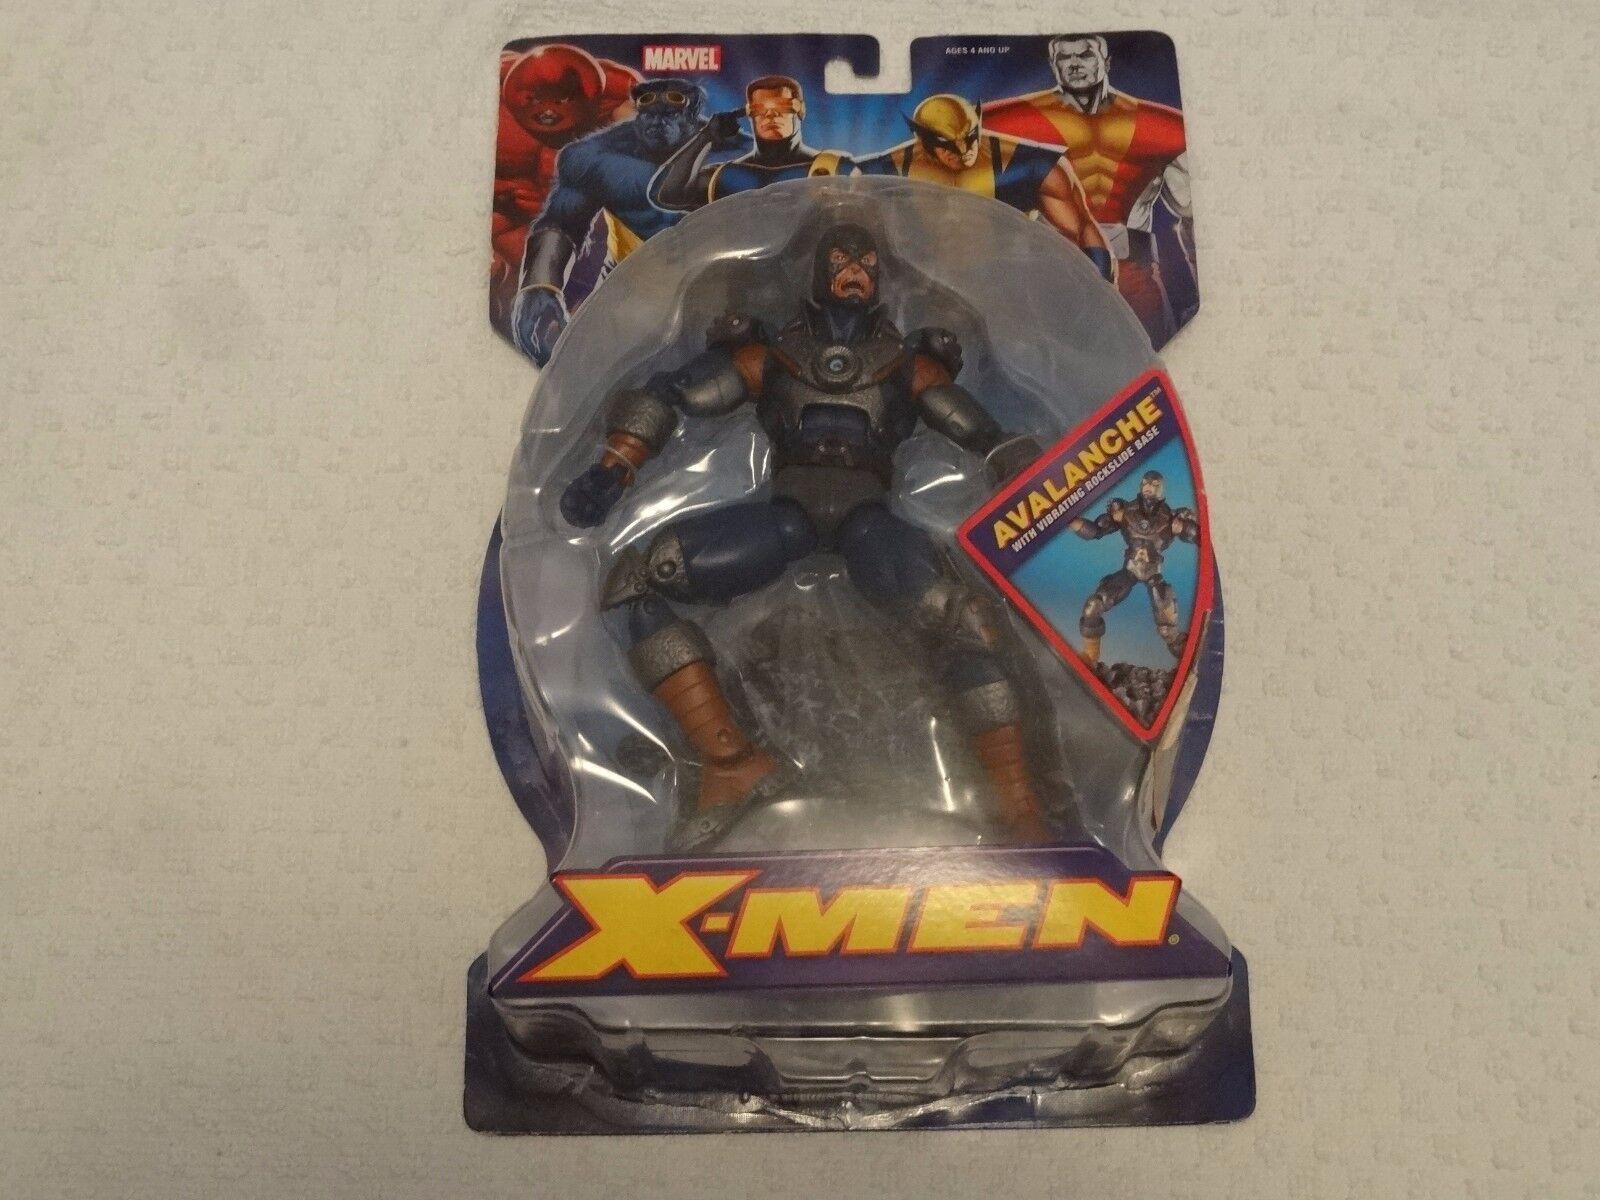 Raro X-men Avalanche Marvel Legends Figura De Acción De 2006 Juguetebiz